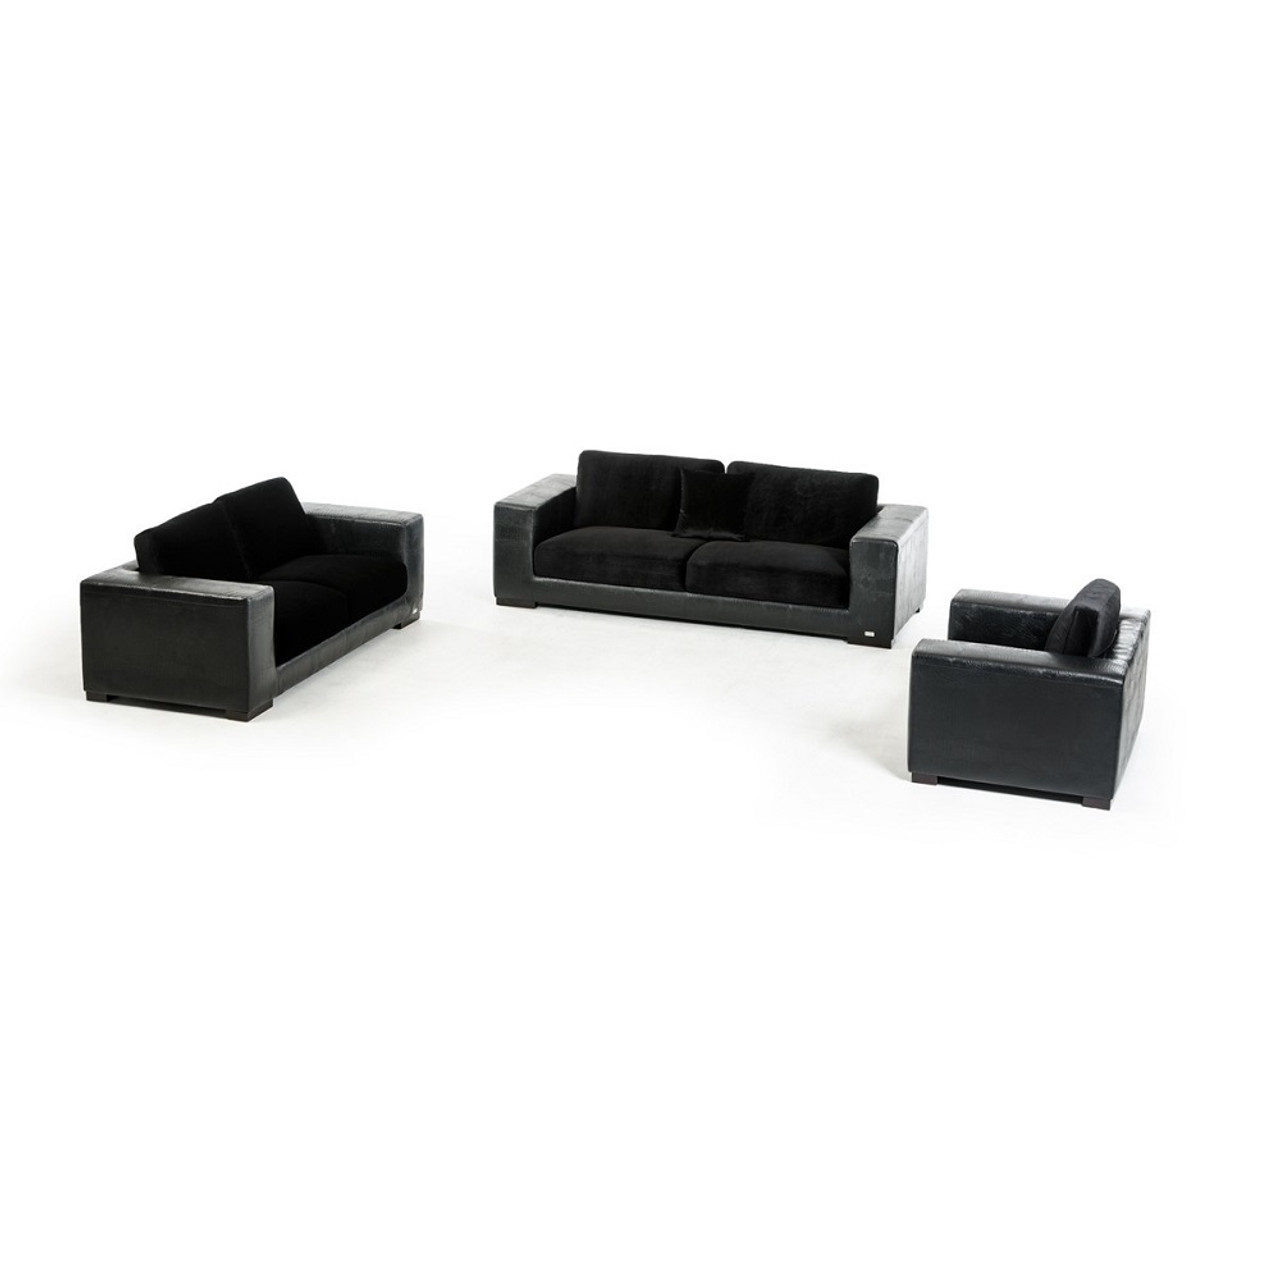 Enjoyable Divani Casa Legrande Modern Black Crocodile Leatherette Sofa Set Gamerscity Chair Design For Home Gamerscityorg